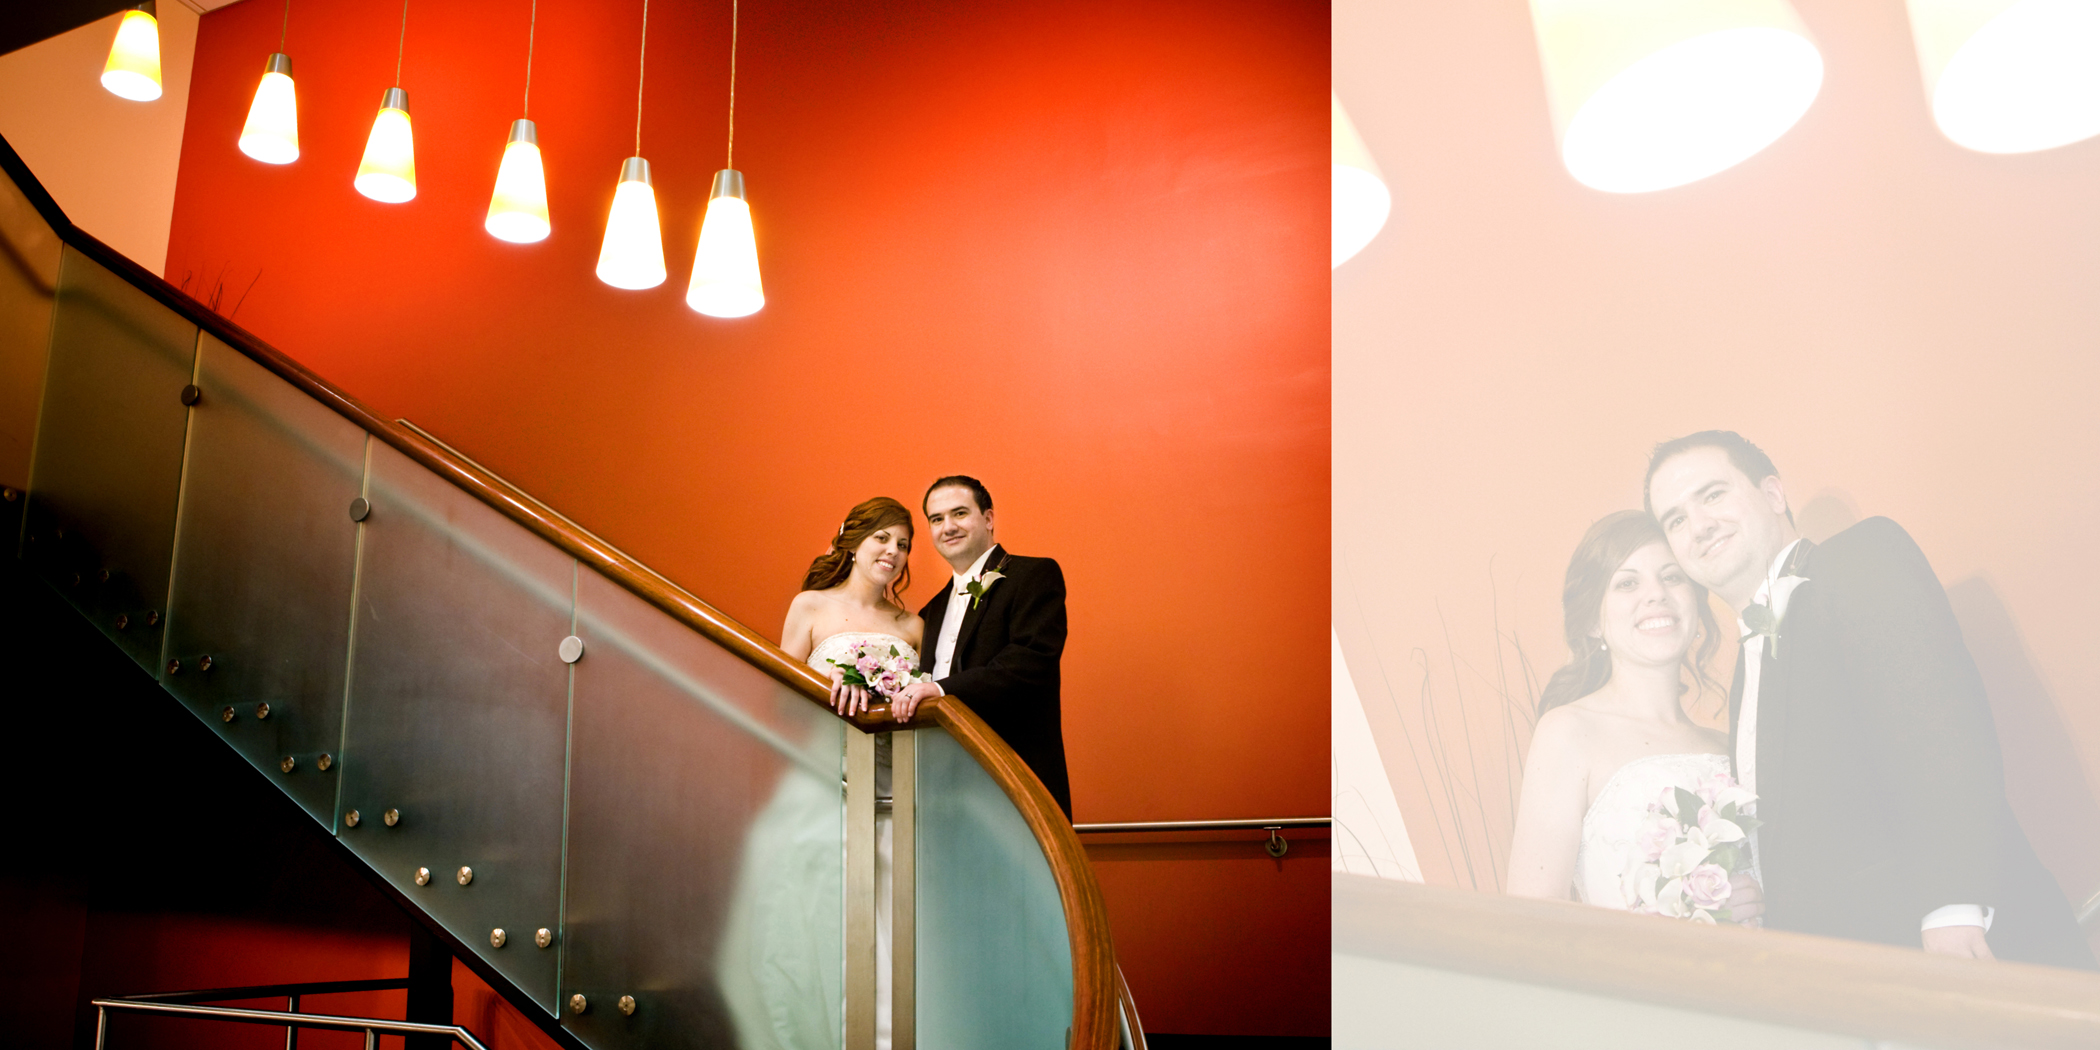 wedding-photography-Andrews-University-Berrien-Springs-Michigan_08.jpg